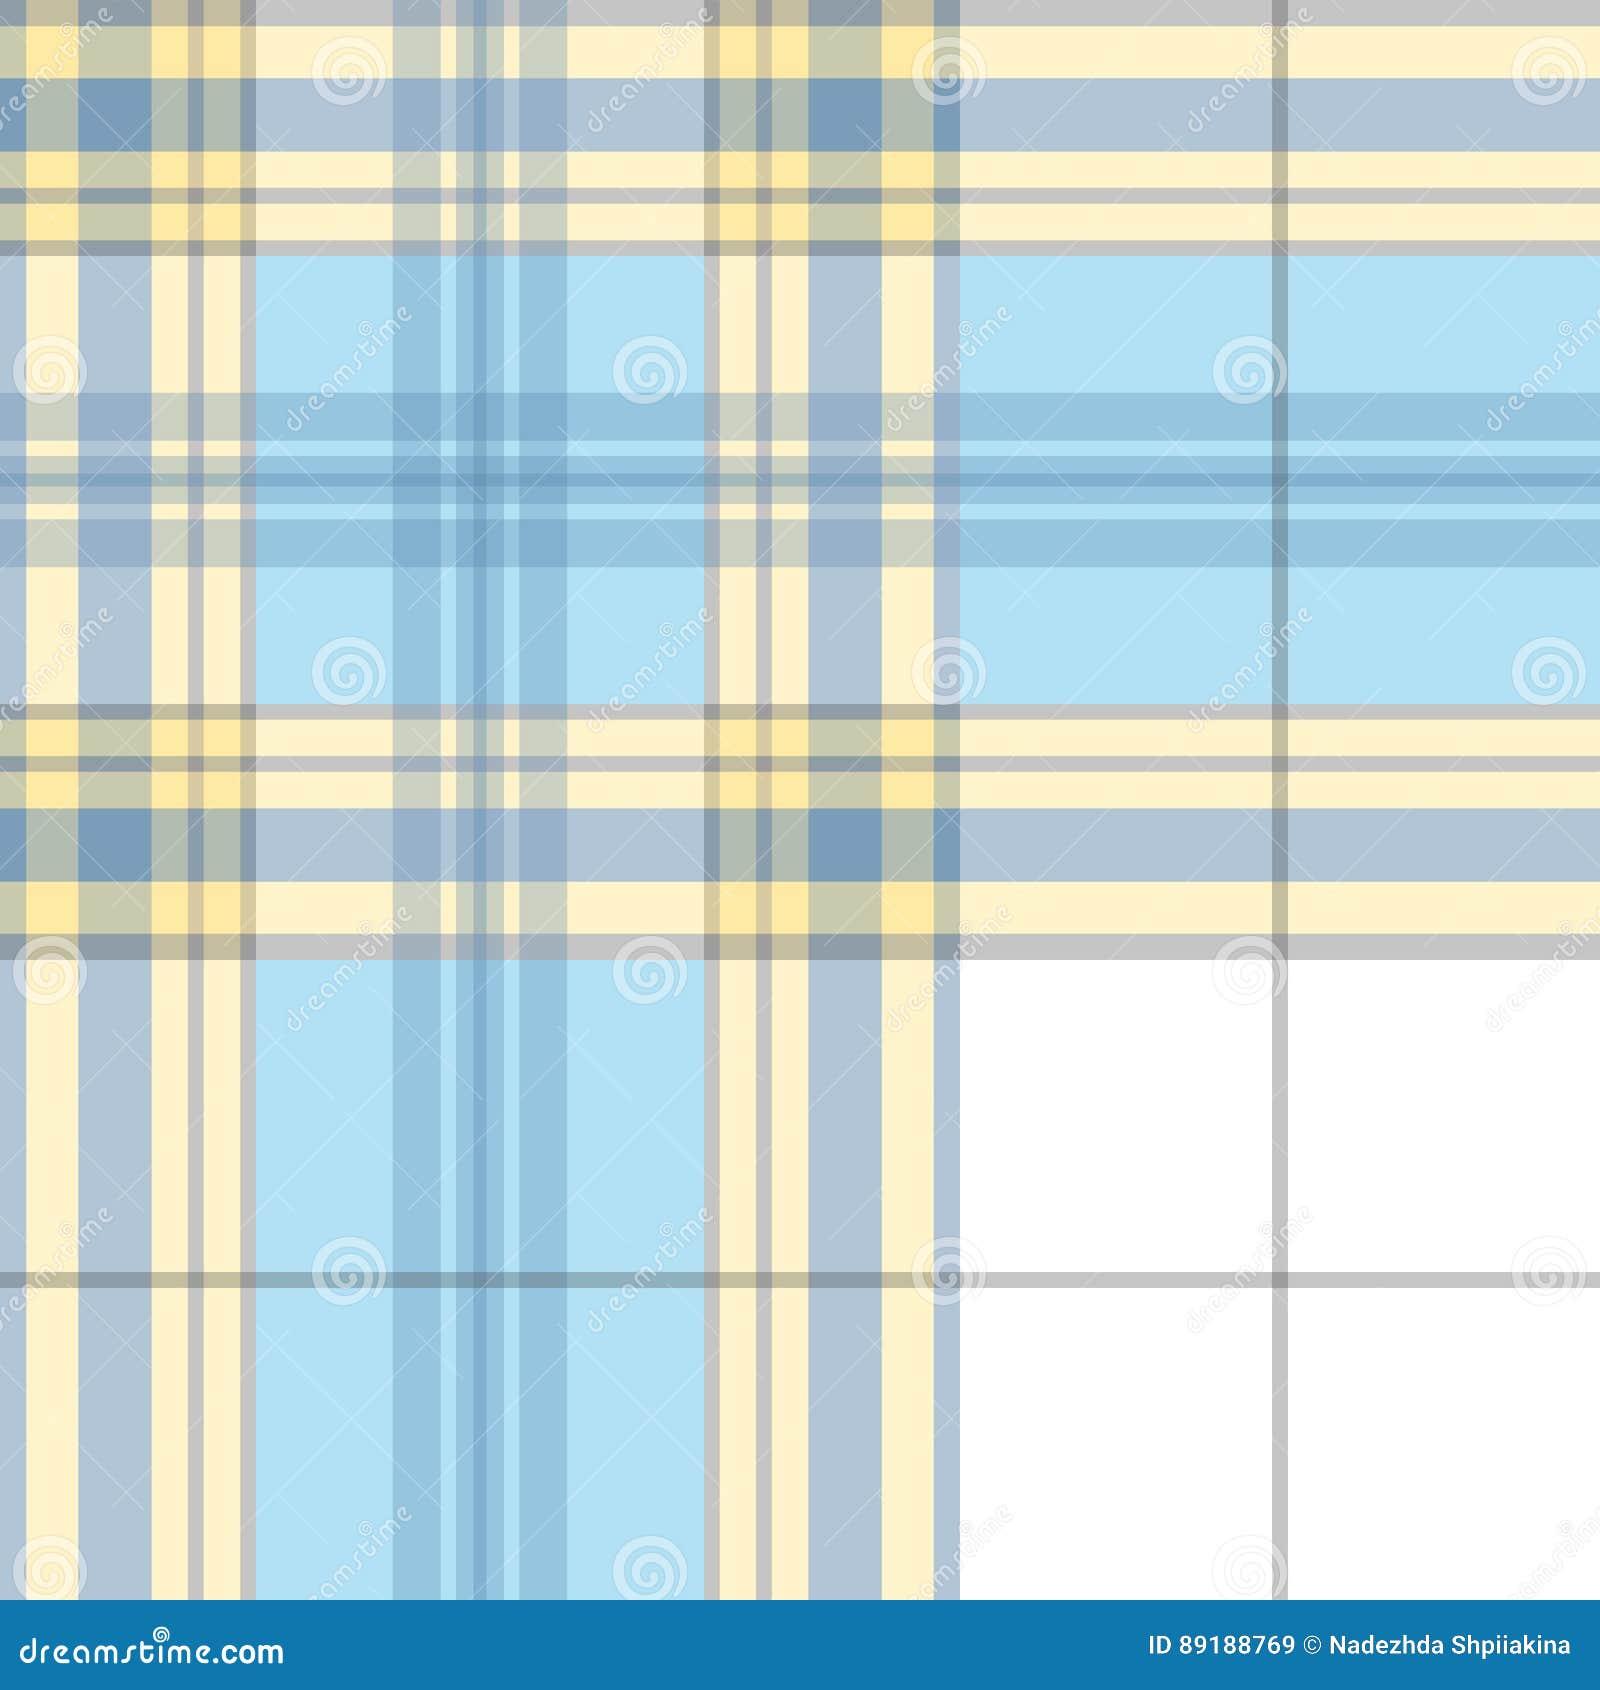 Plaid Pattern Blue Background Black And White Line Vector Illustration